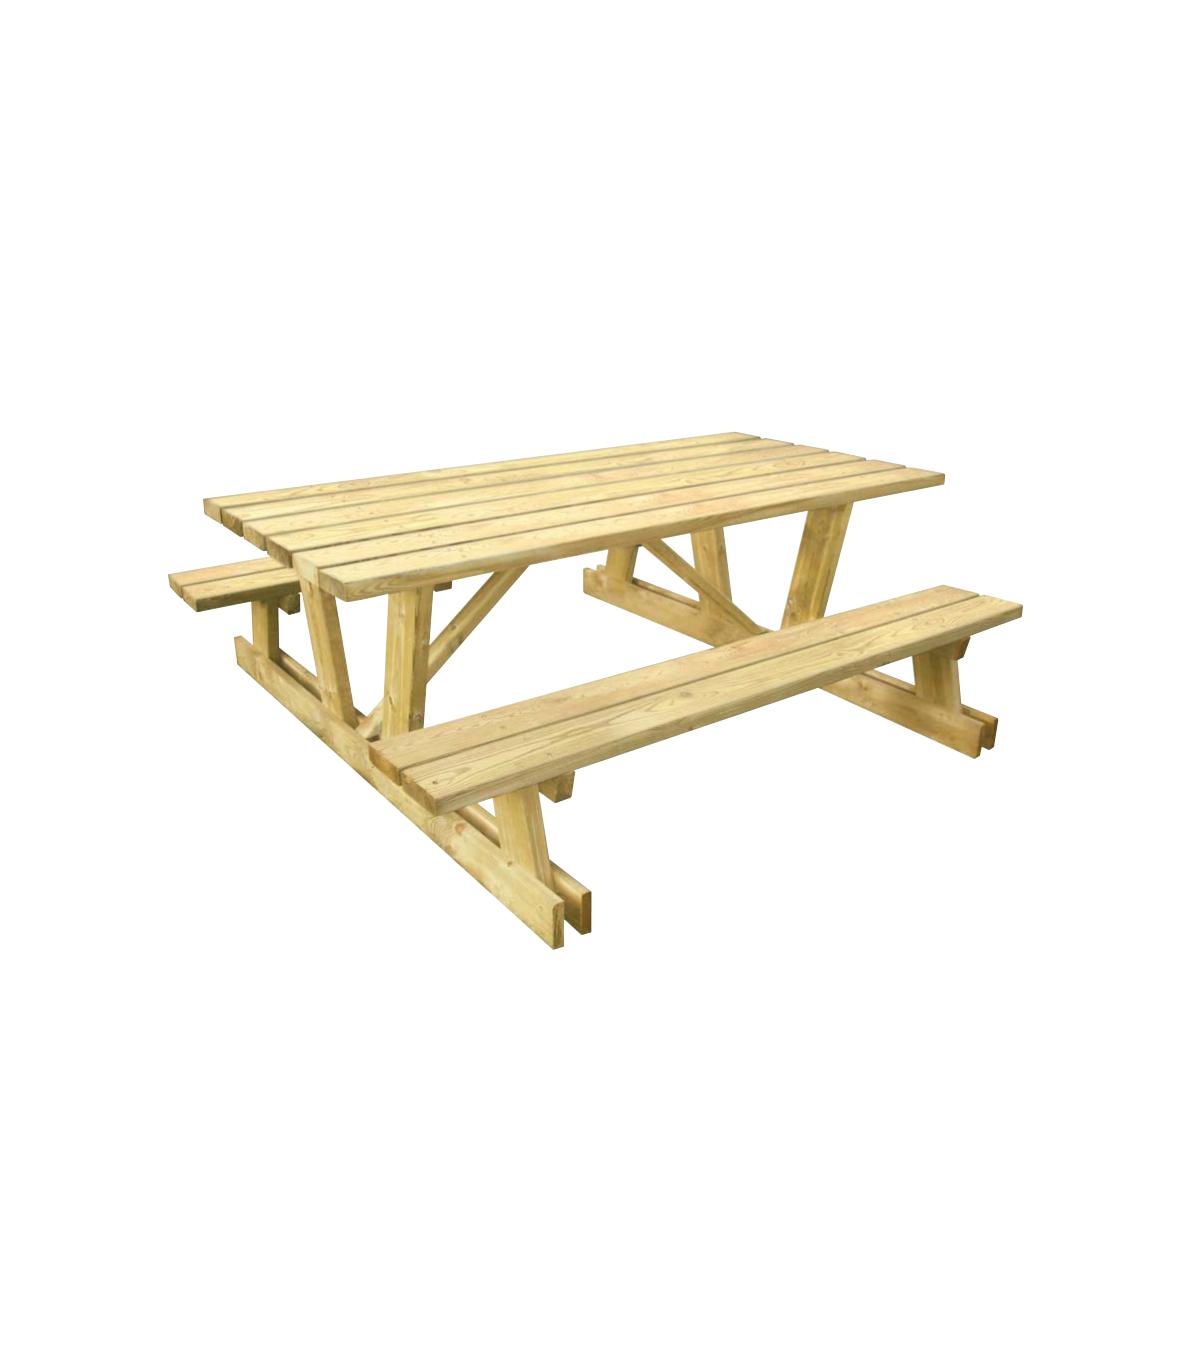 table bois pic nique dortmunt yep. Black Bedroom Furniture Sets. Home Design Ideas